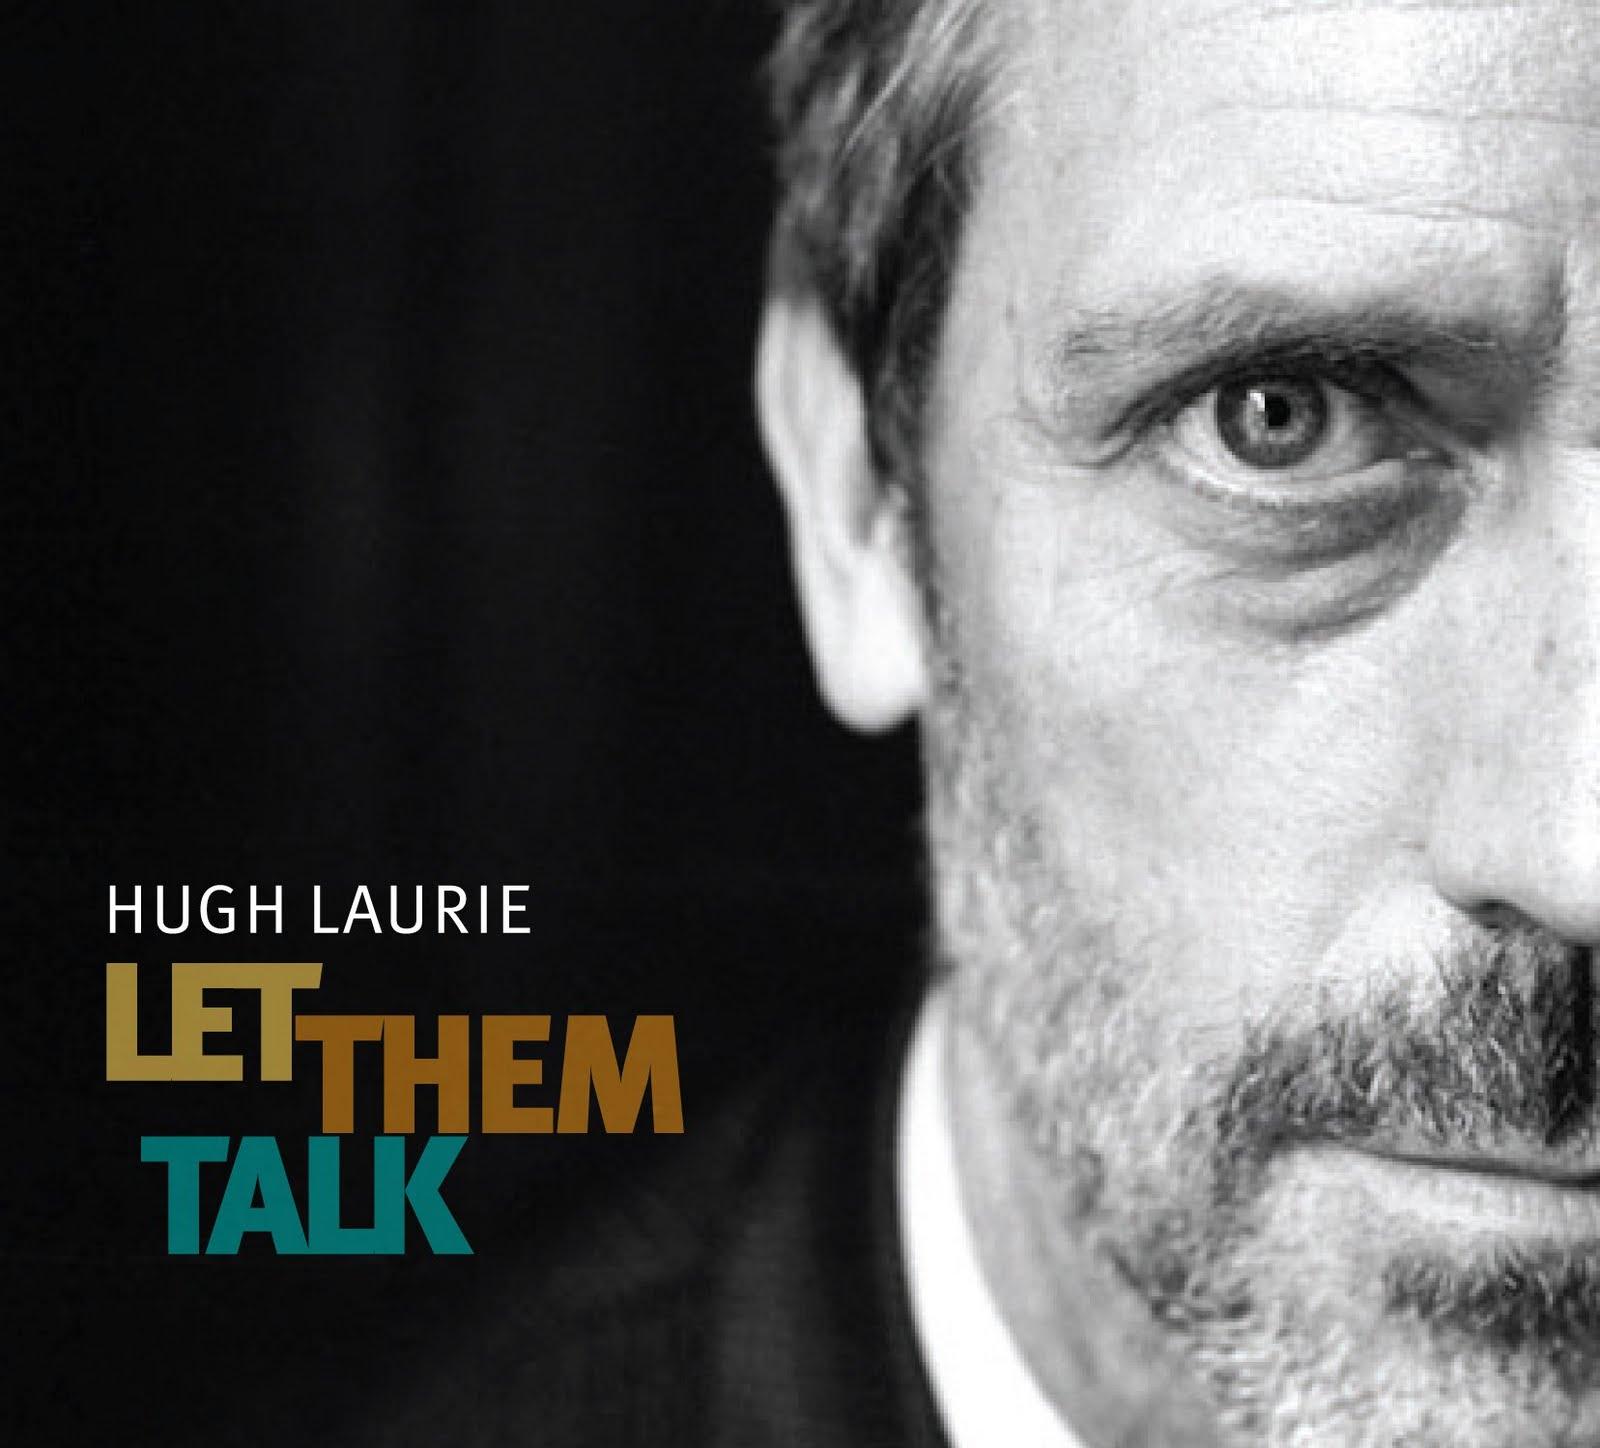 http://3.bp.blogspot.com/-EL-d-RggRTs/UFH92DrAjCI/AAAAAAAAAFg/LCkyX8SYiV8/s1600/hugh-laurie-let-them-talk-.jpg